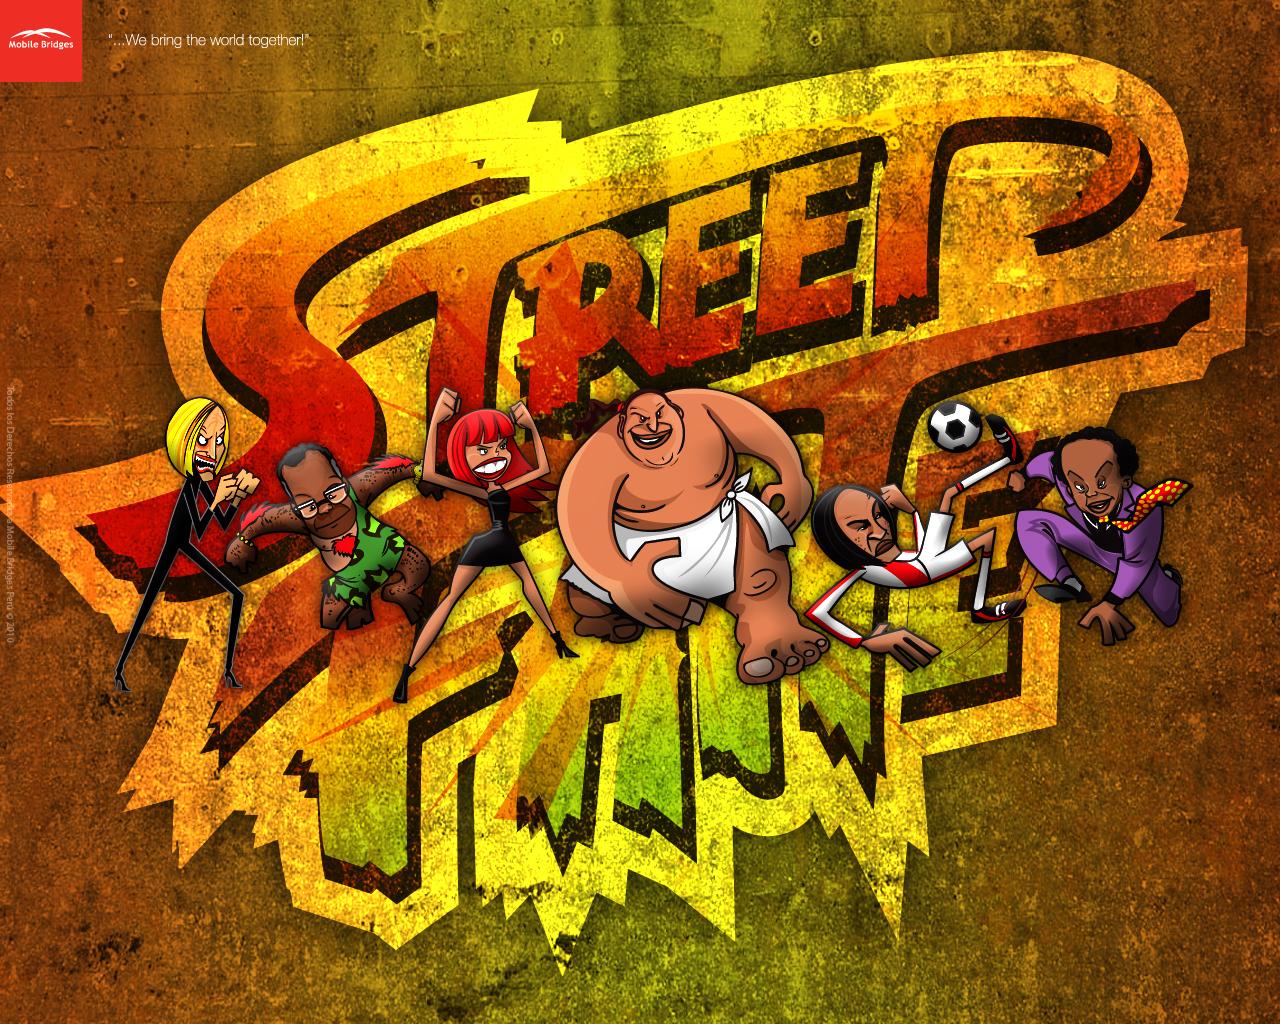 Street Faite: Juego Facebook Nuevo!!!!